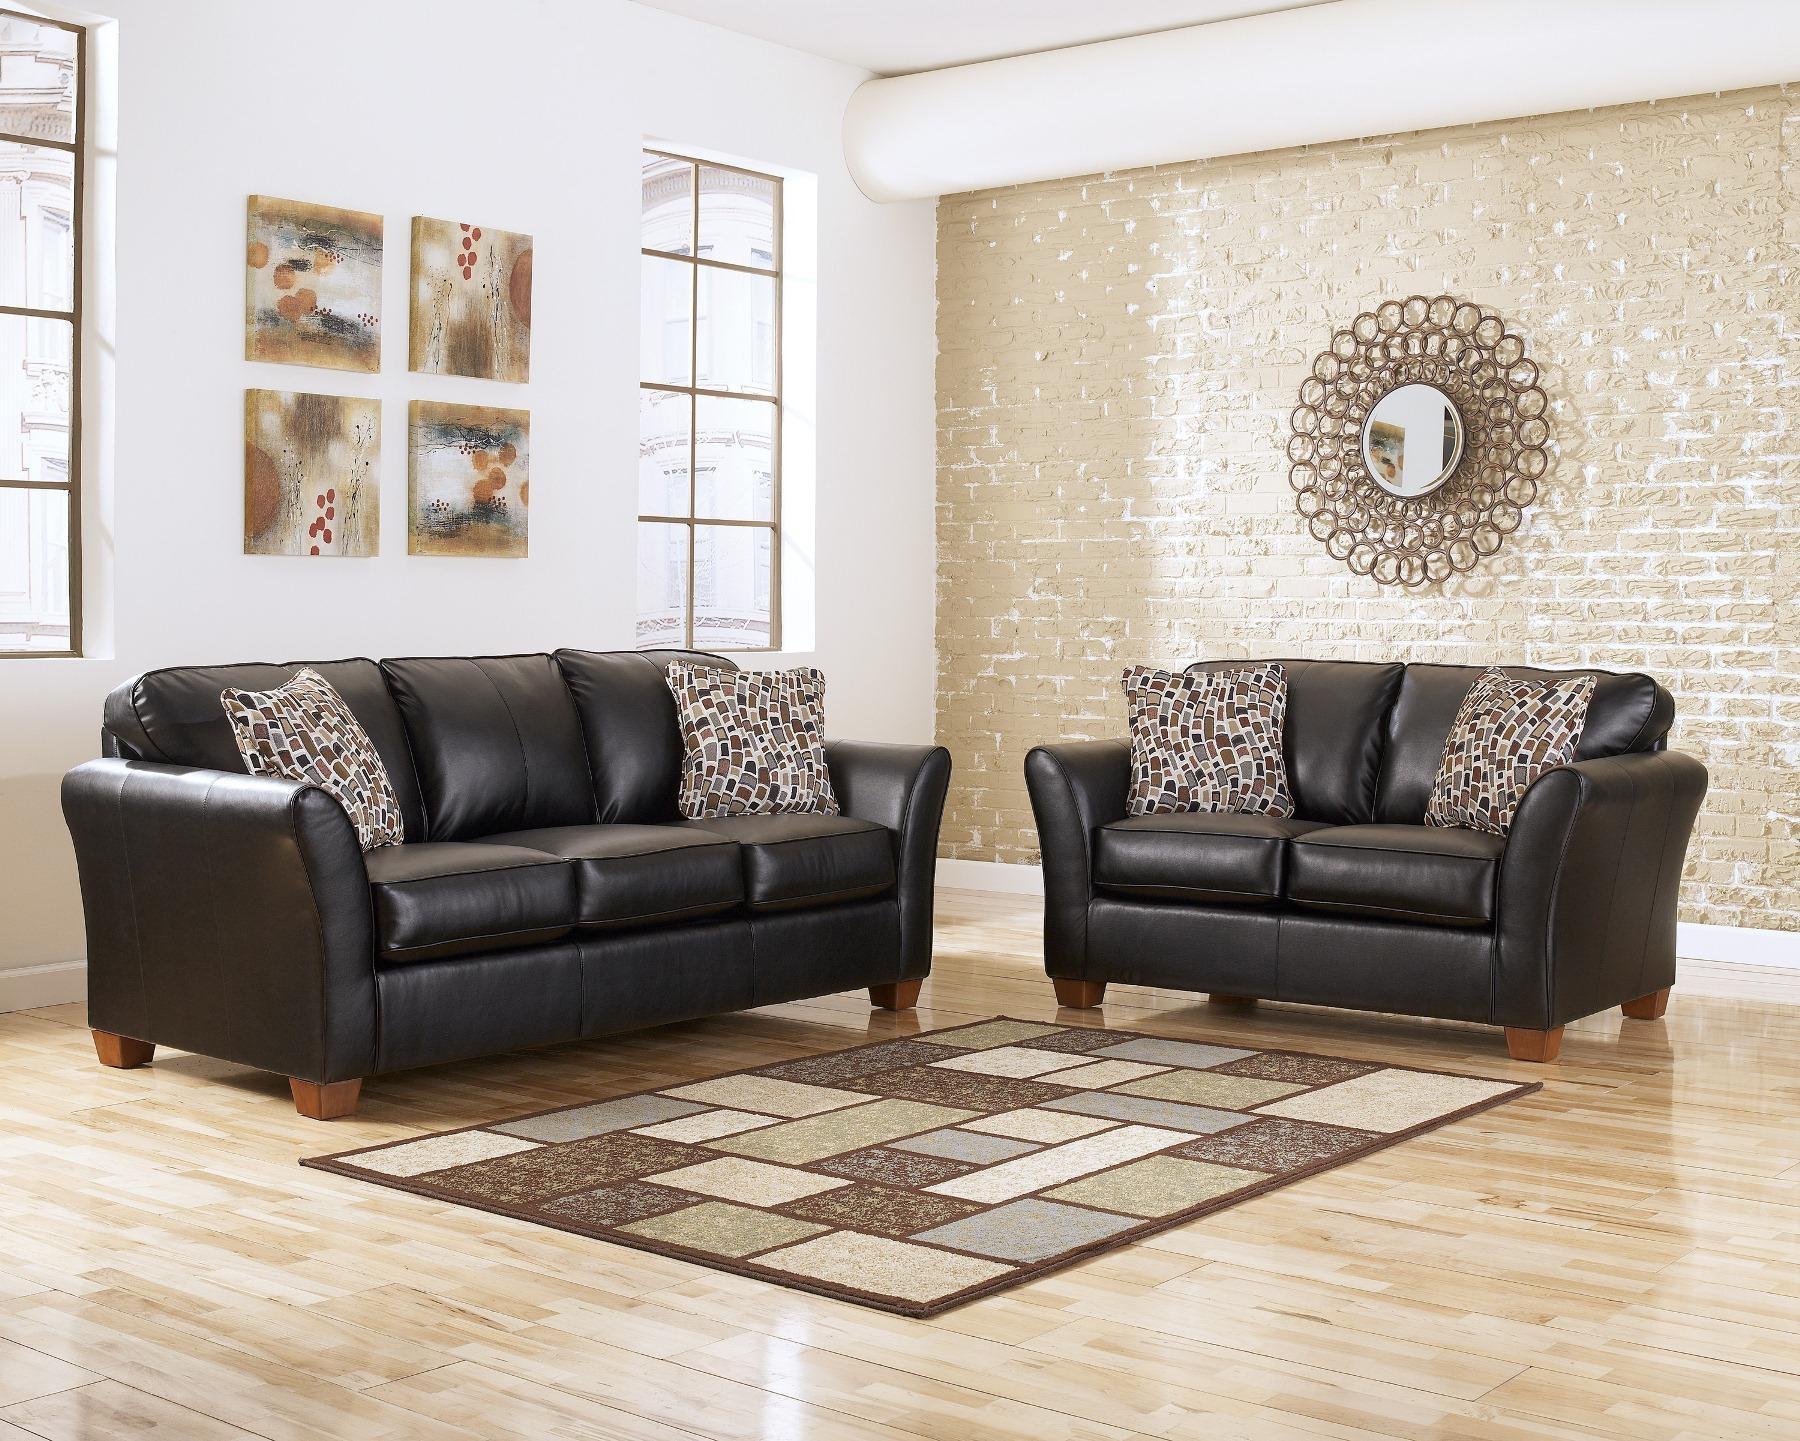 Sofas Center : Big Lots Sleeper Sofa Sectional Mattress Lotsbig In Big Lots Sofas (Image 13 of 20)